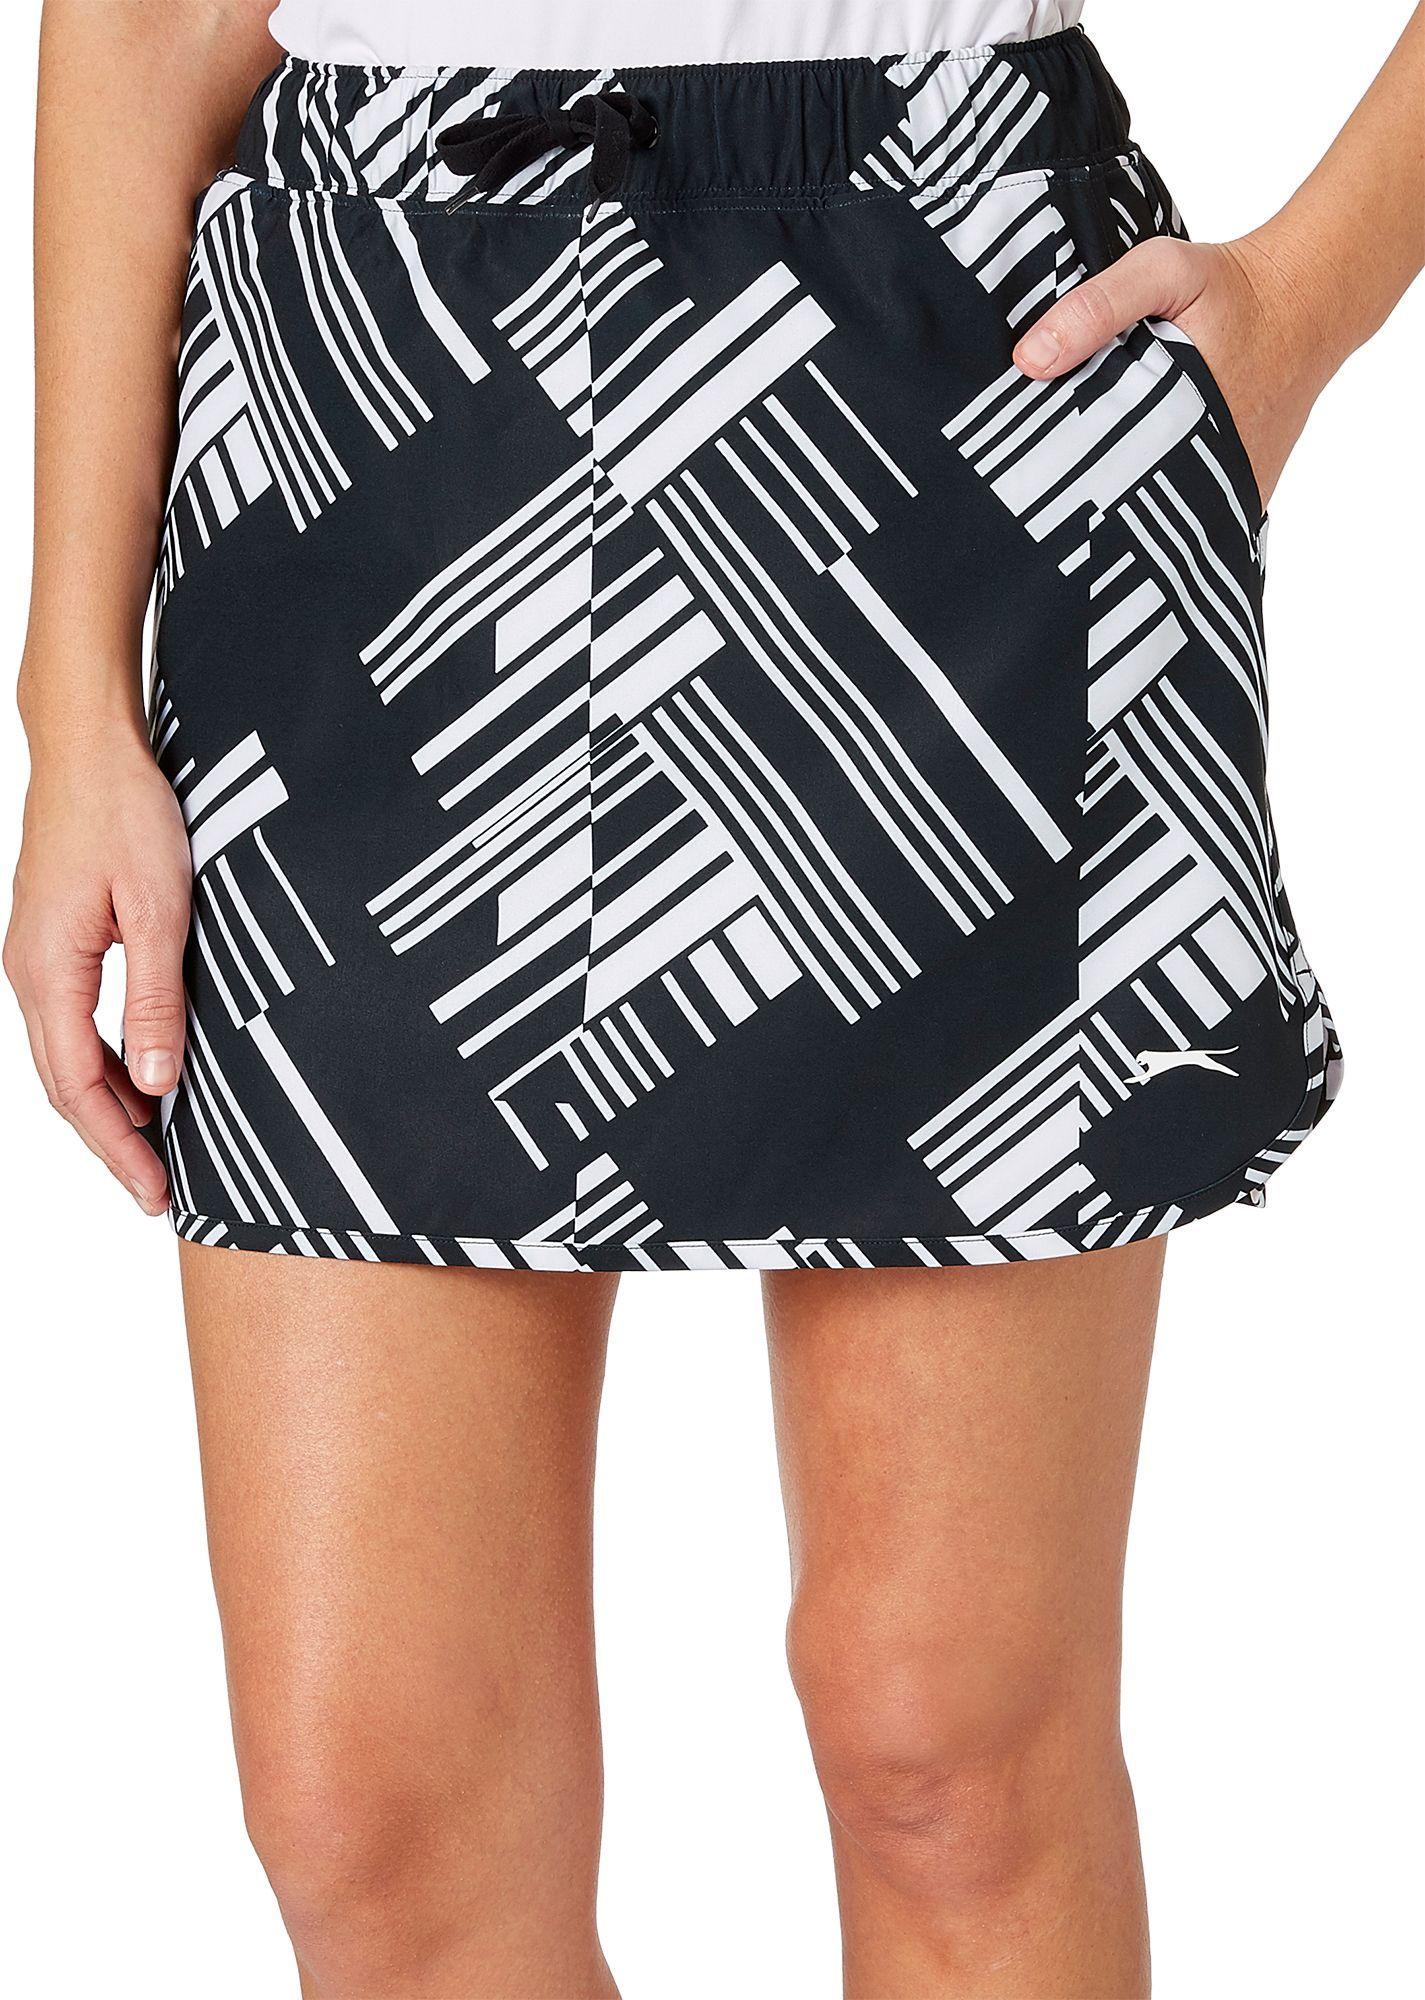 47bc6374f5d Slazenger Women's Lite Bright Collection Printed Pull On Golf Skort, Size:  Medium, Black